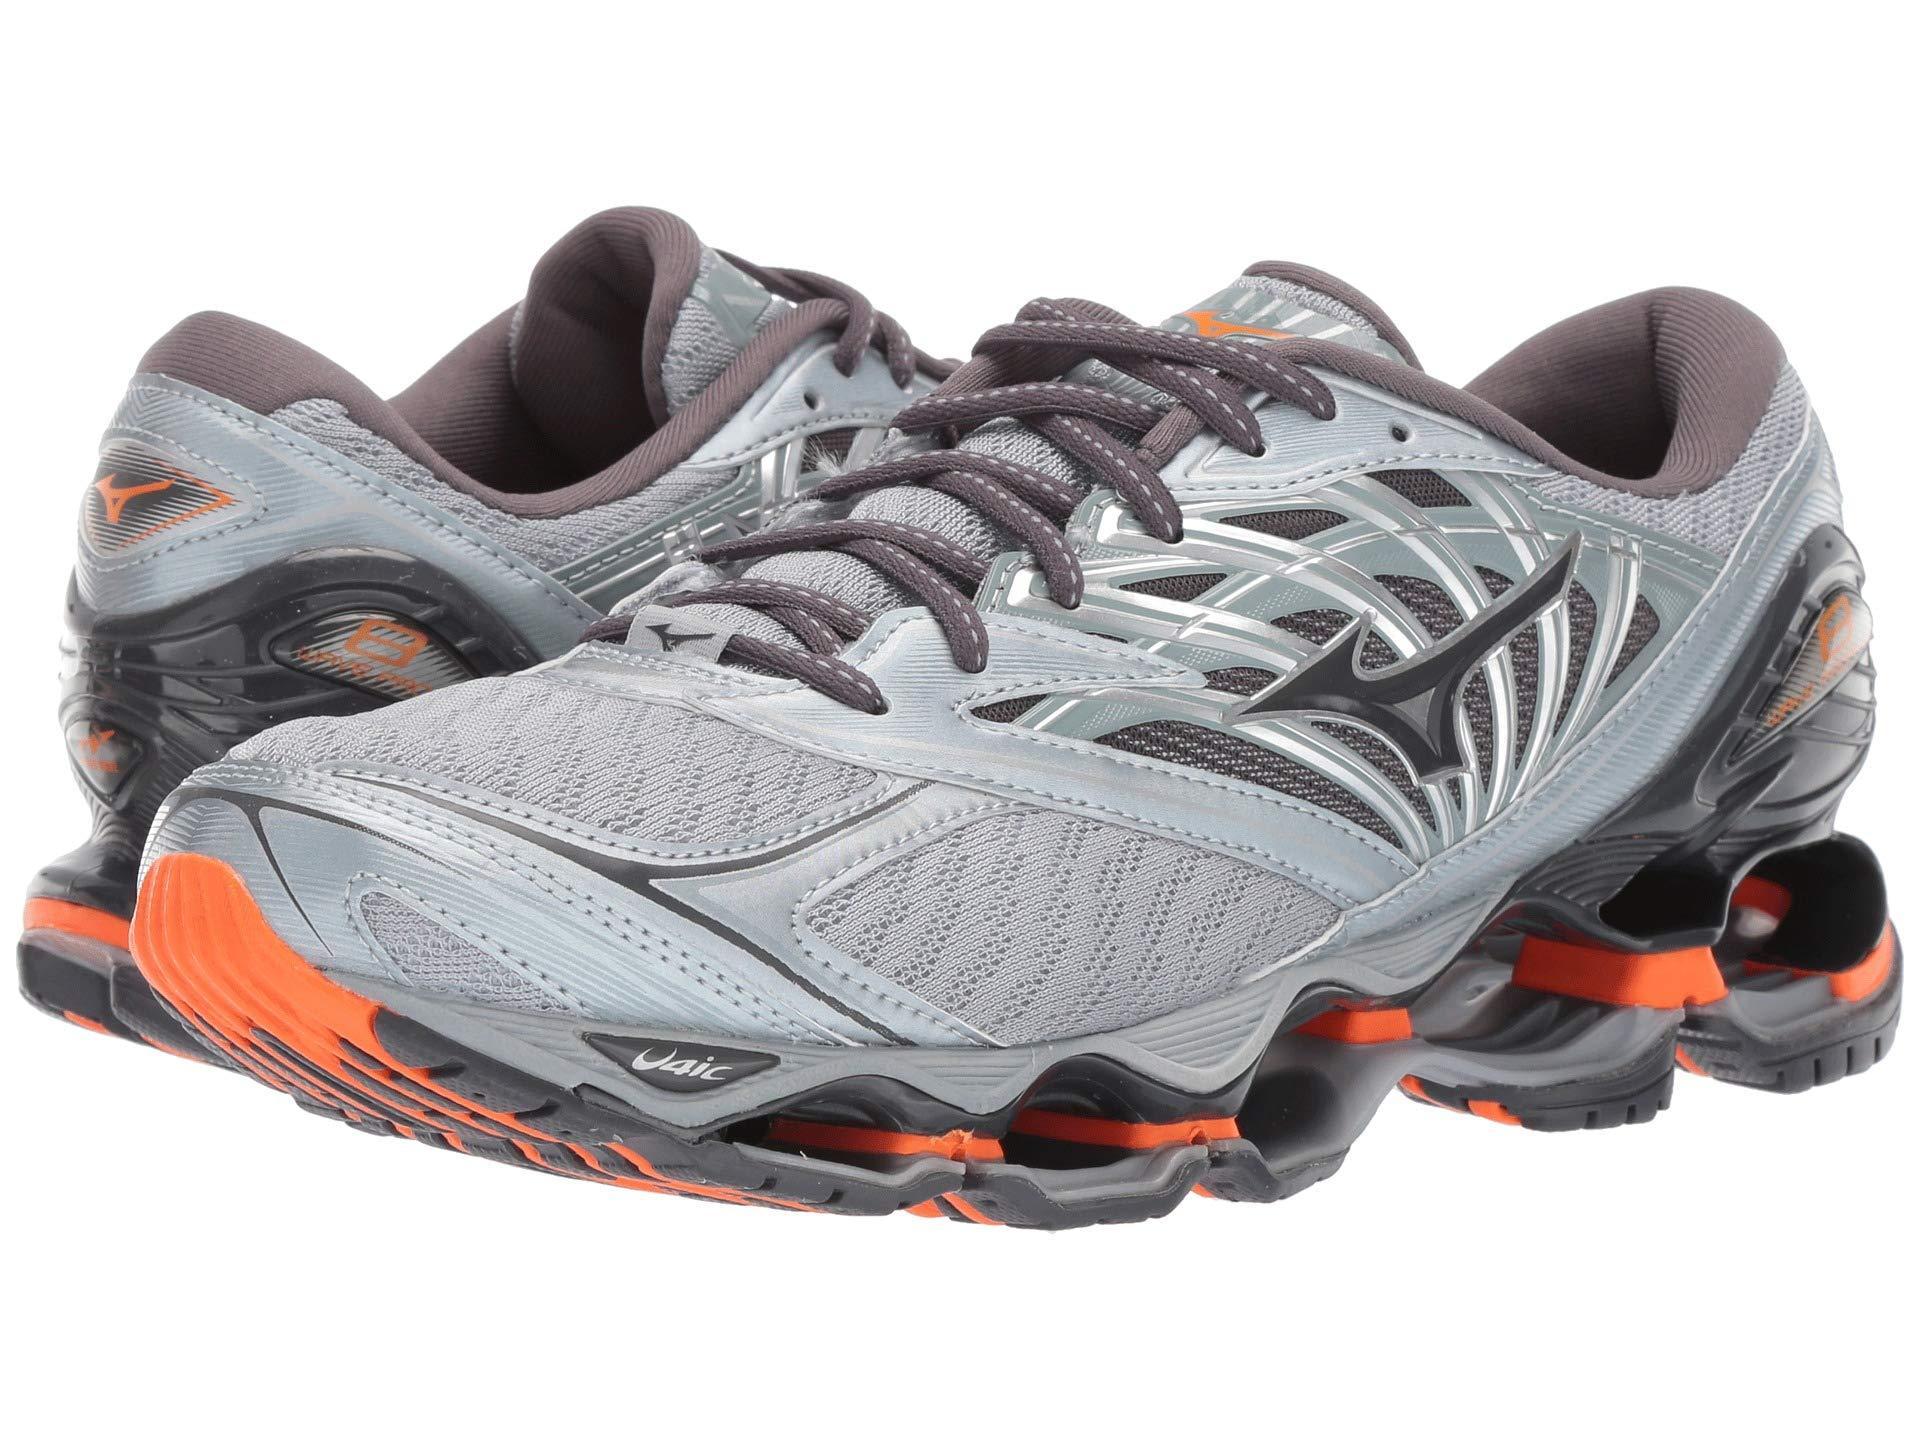 new style c675e 210bd Mizuno Wave Prophecy 8 (quarry graphite) Men s Running Shoes for Men ...